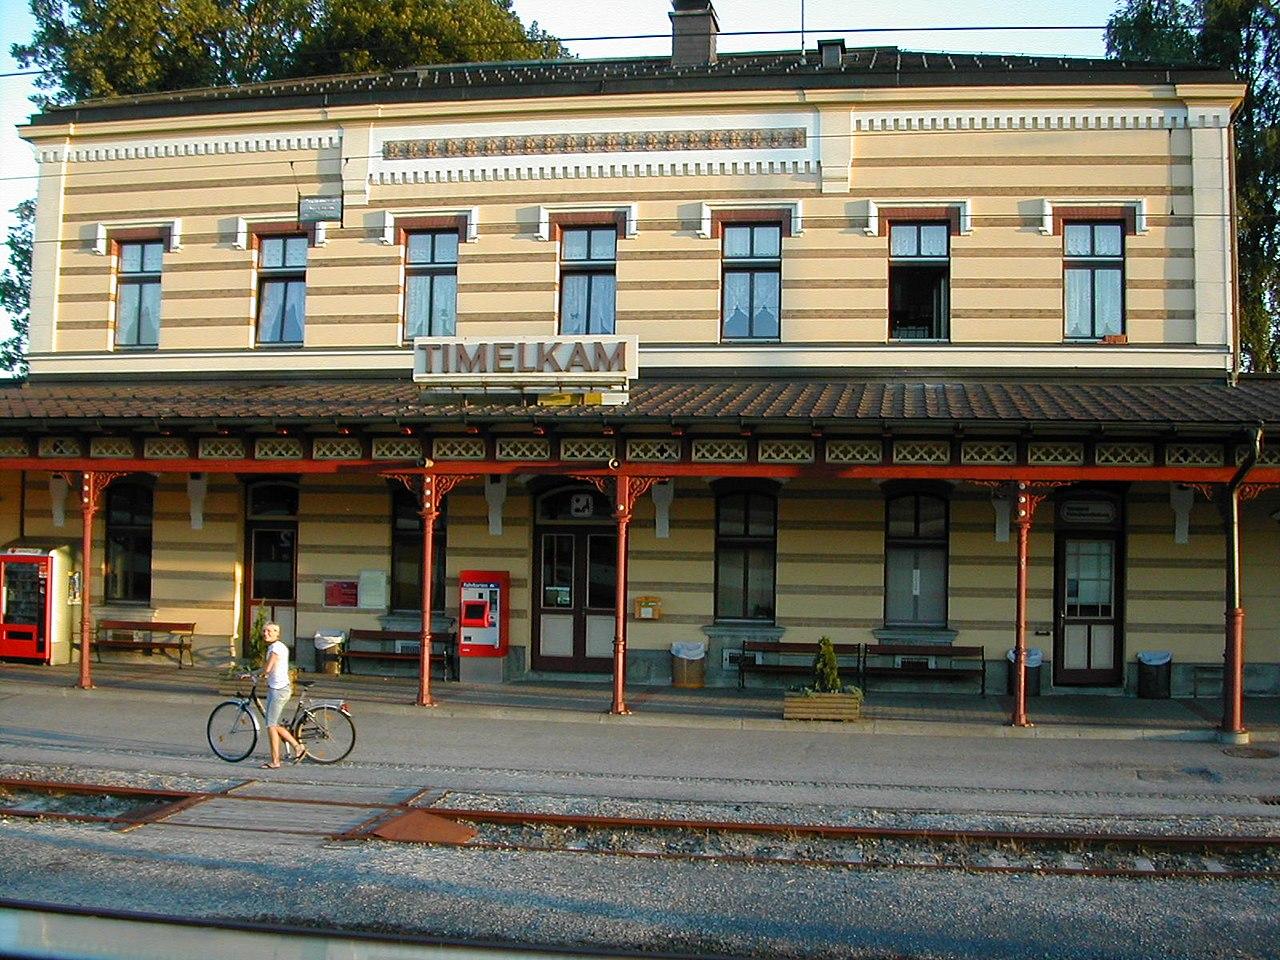 Escort In Timelkam Sites - Paar Sucht Paar Graz Stragang